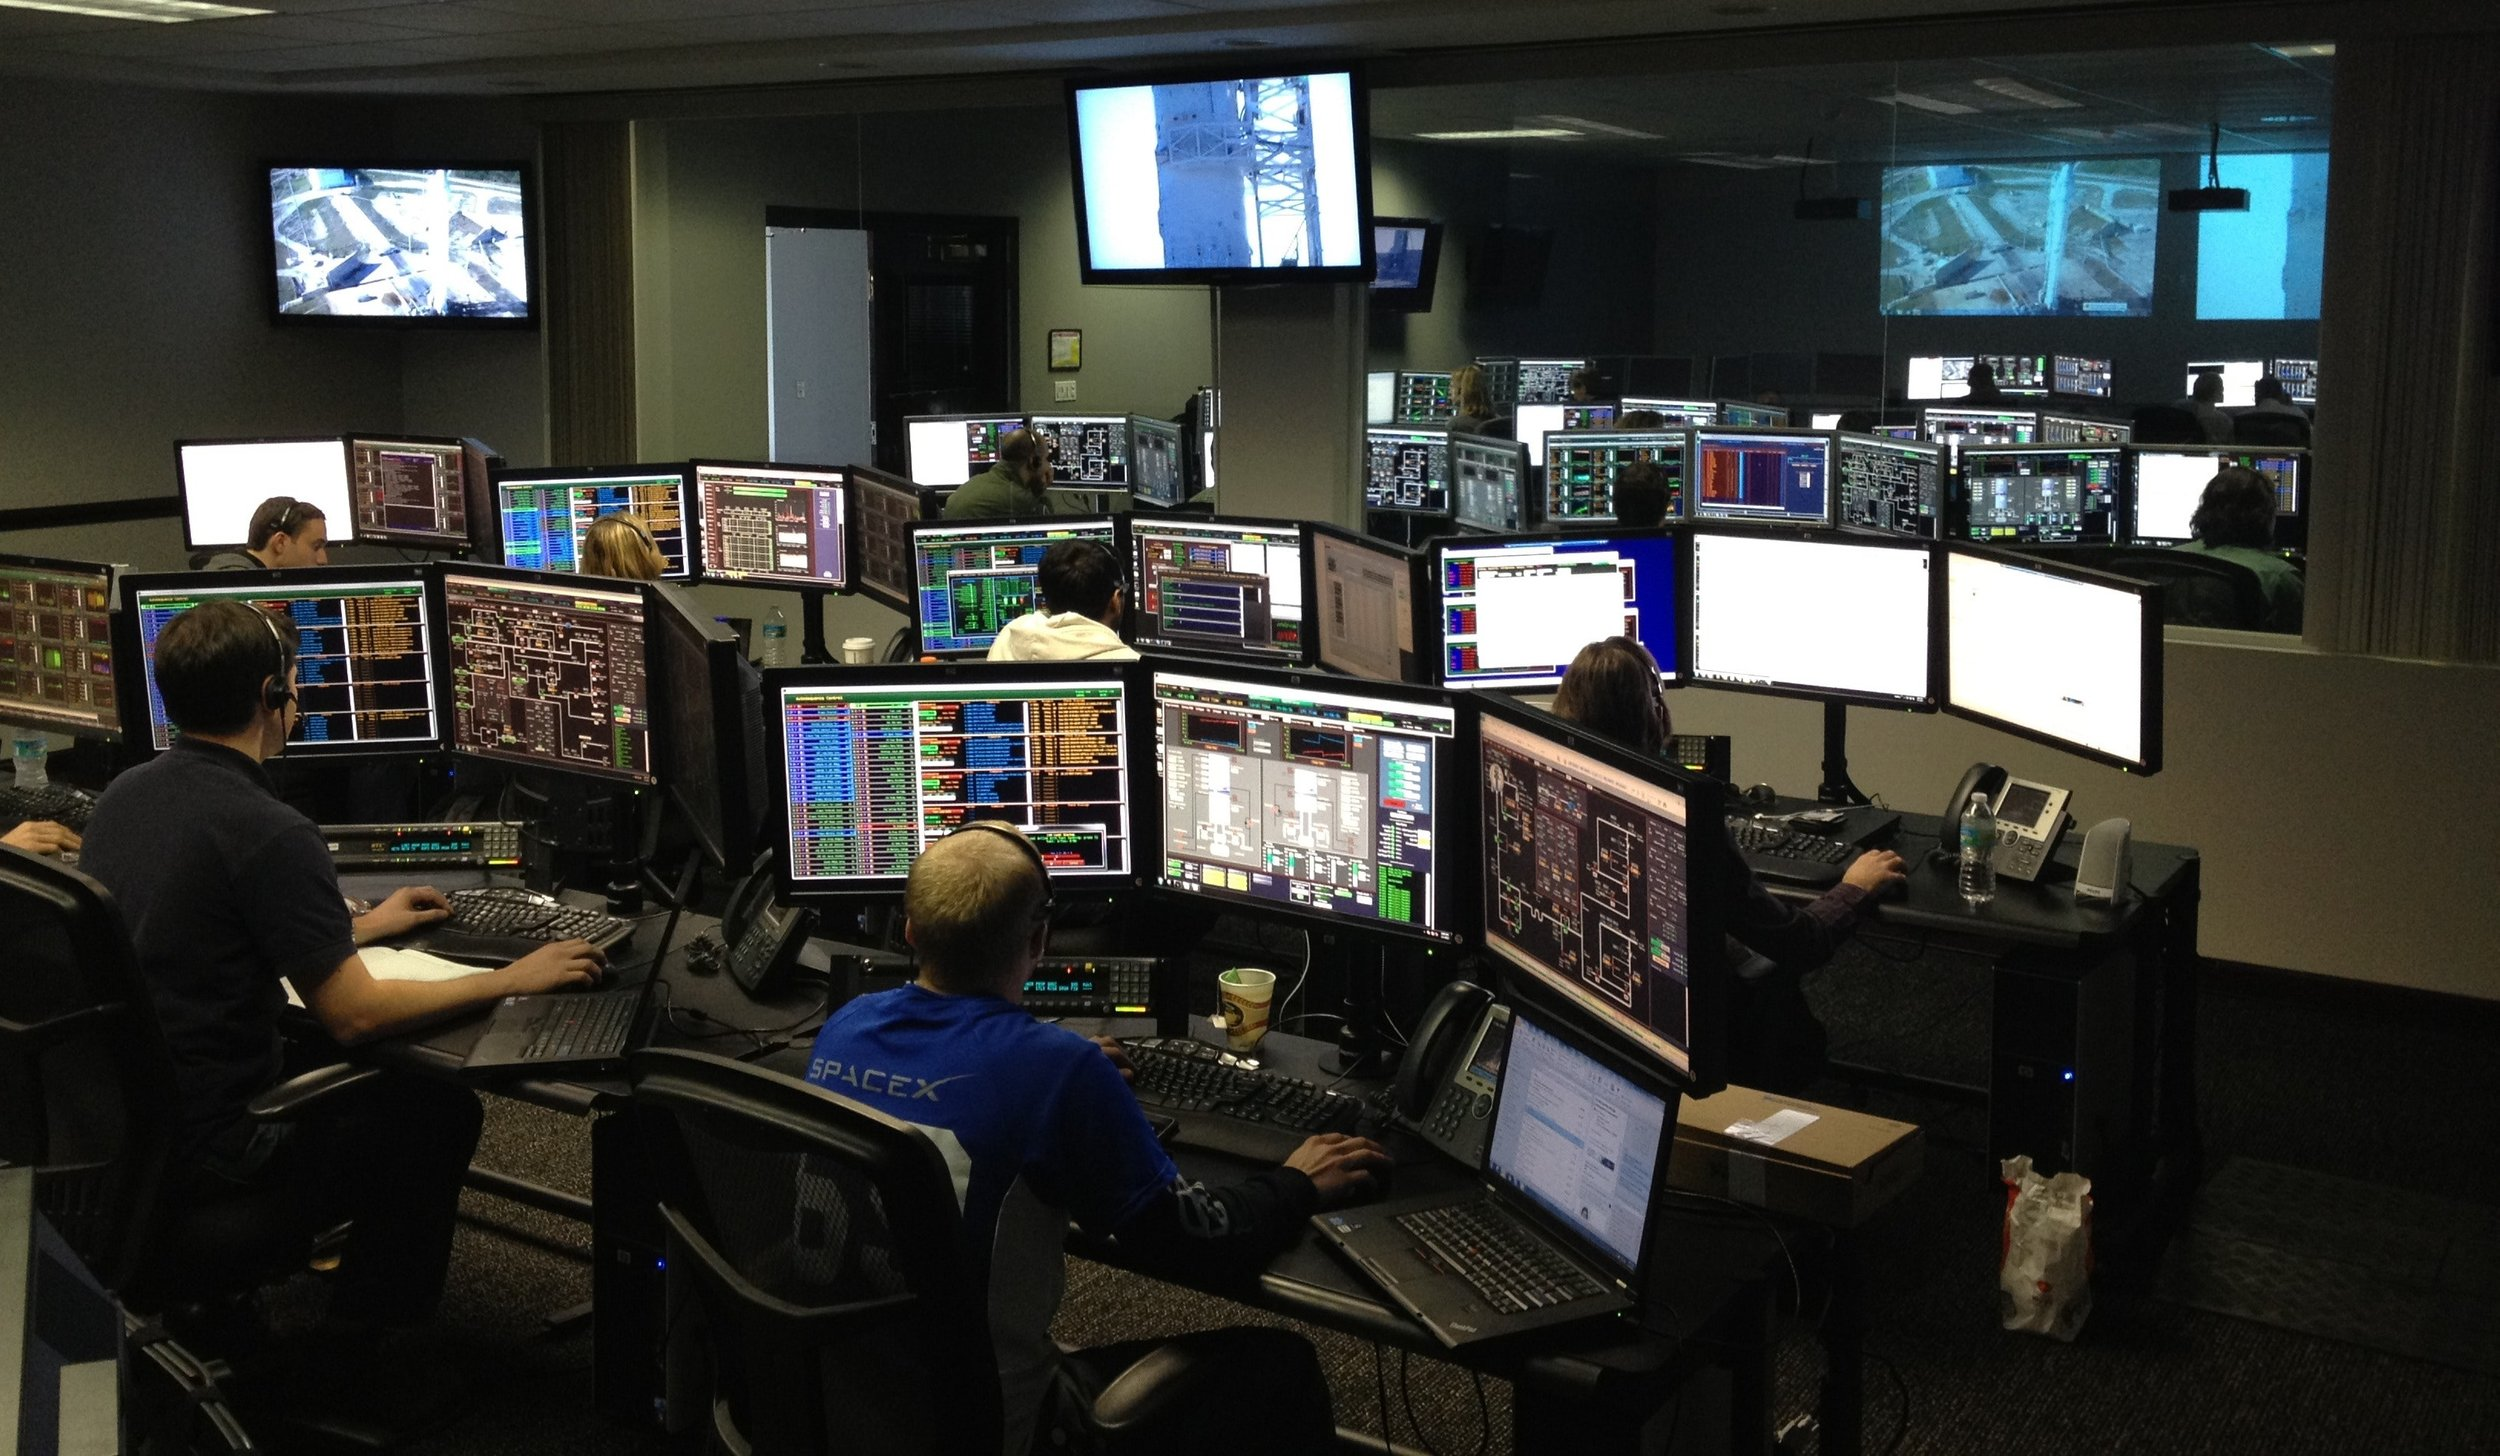 connection-control-center-desk-256219.jpg